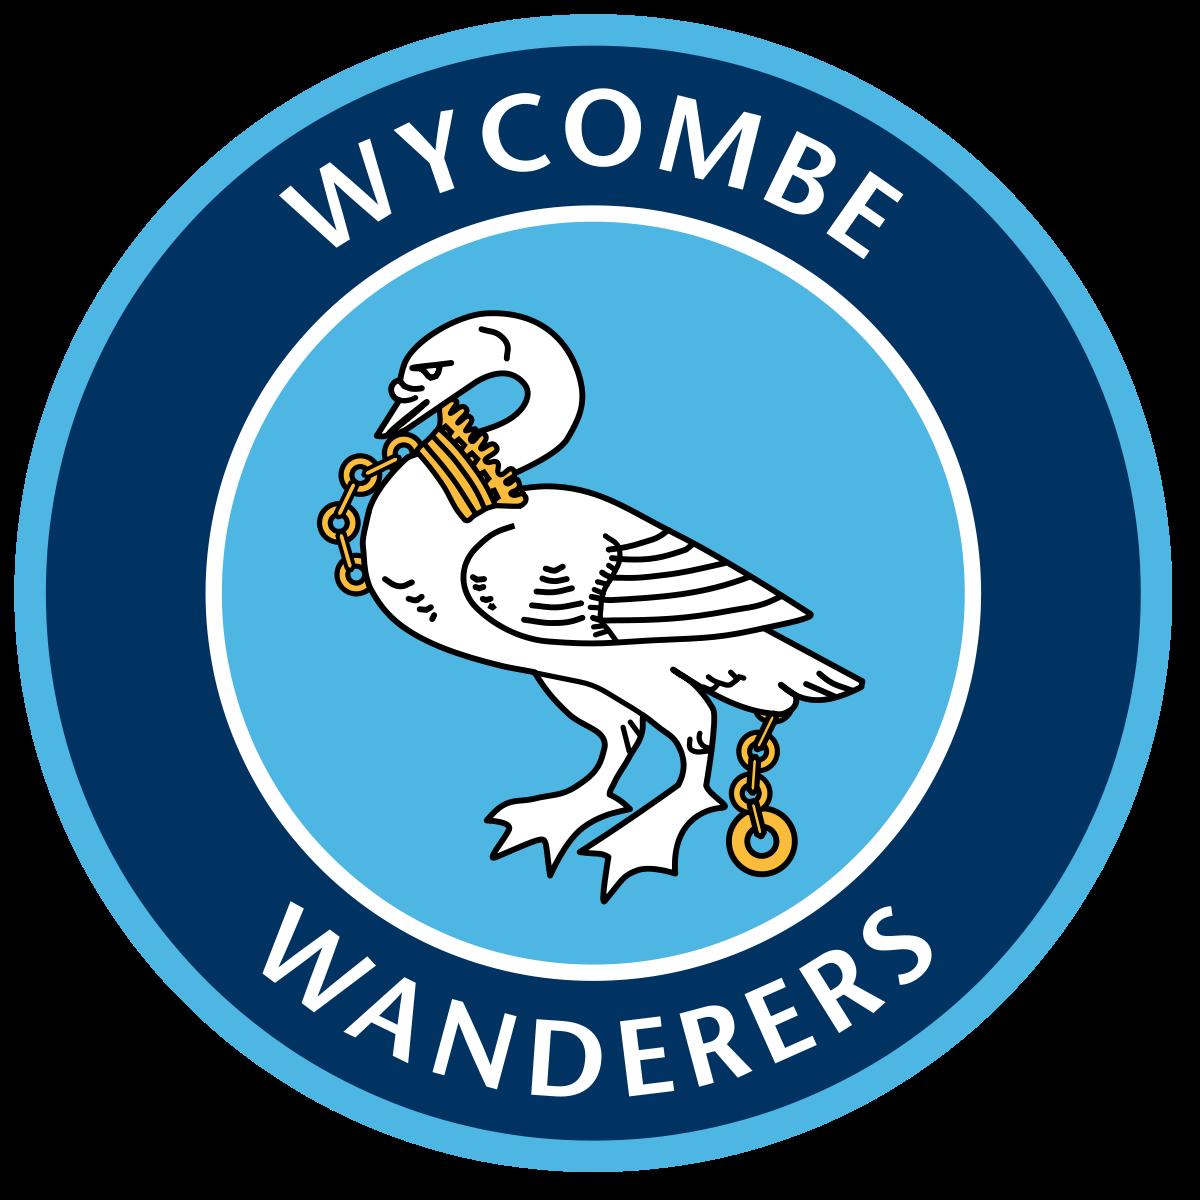 Wycombe Wanderers Football Club